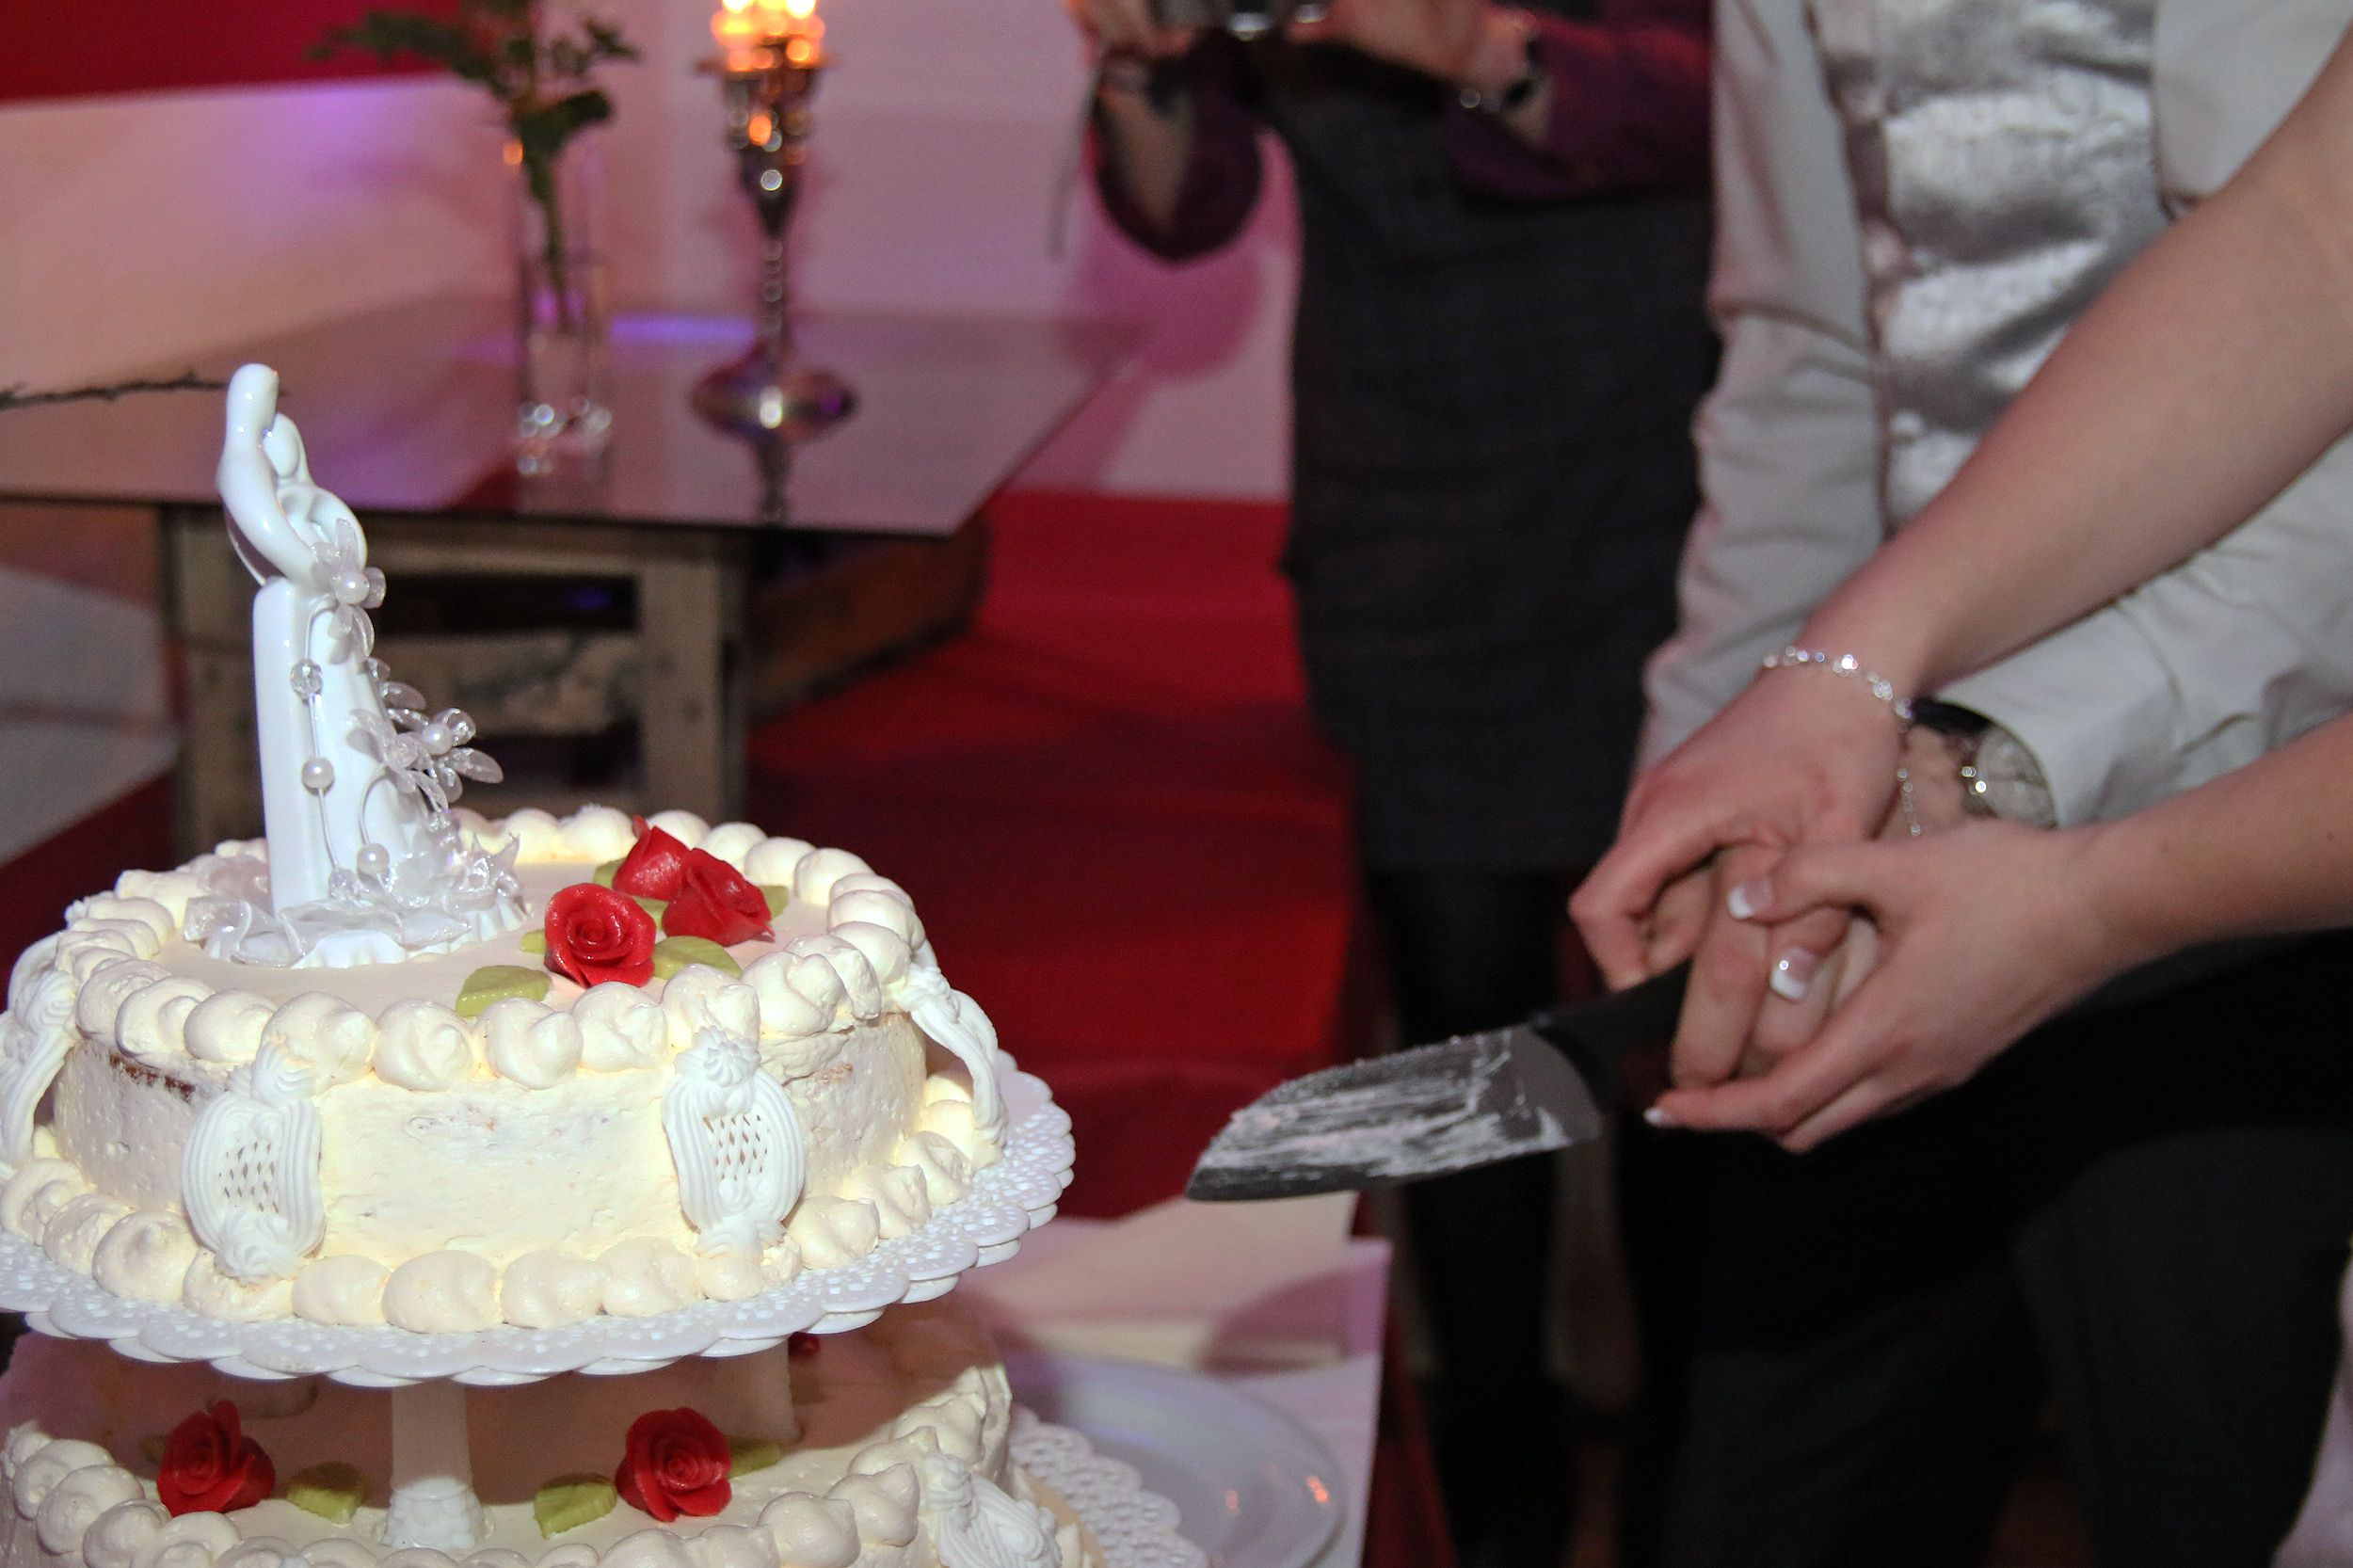 Anschnitt Der Hochzeitstorte Dj Gottingen Pinterest Gottingen